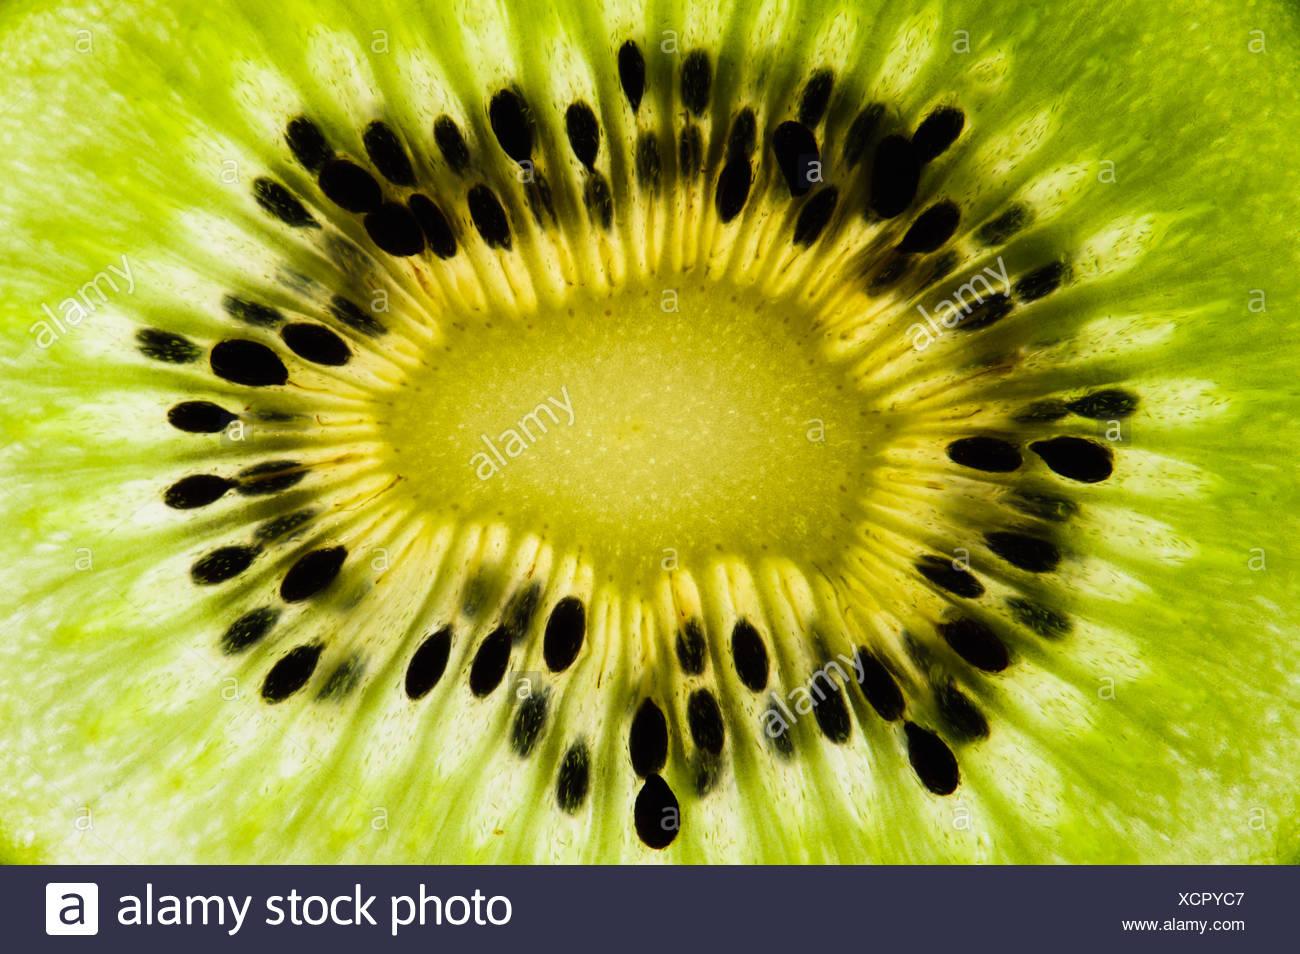 plant detail admission fruit perusal kiwi kiwischeibe kiwikern kiwiquerschnitt - Stock Image